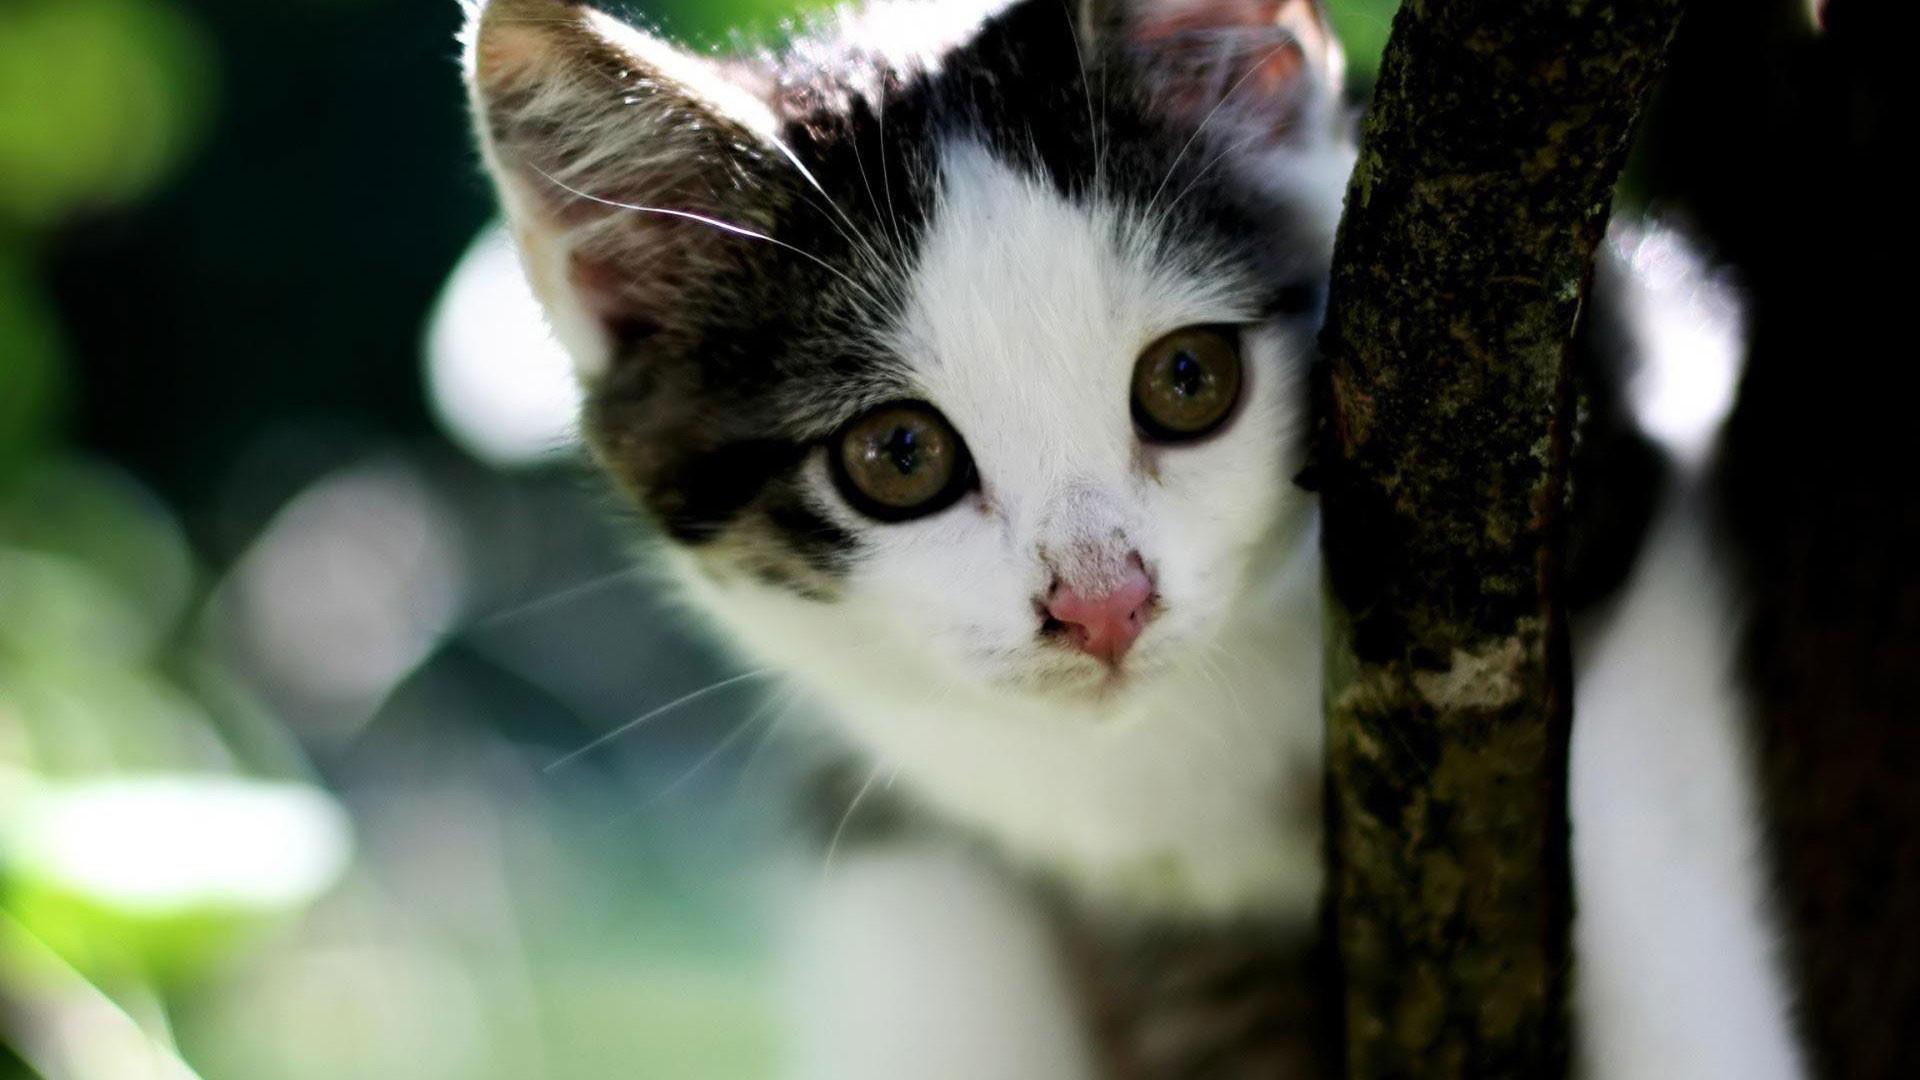 hd pics photos cute kitten cat tree hd quality desktop background wallpaper